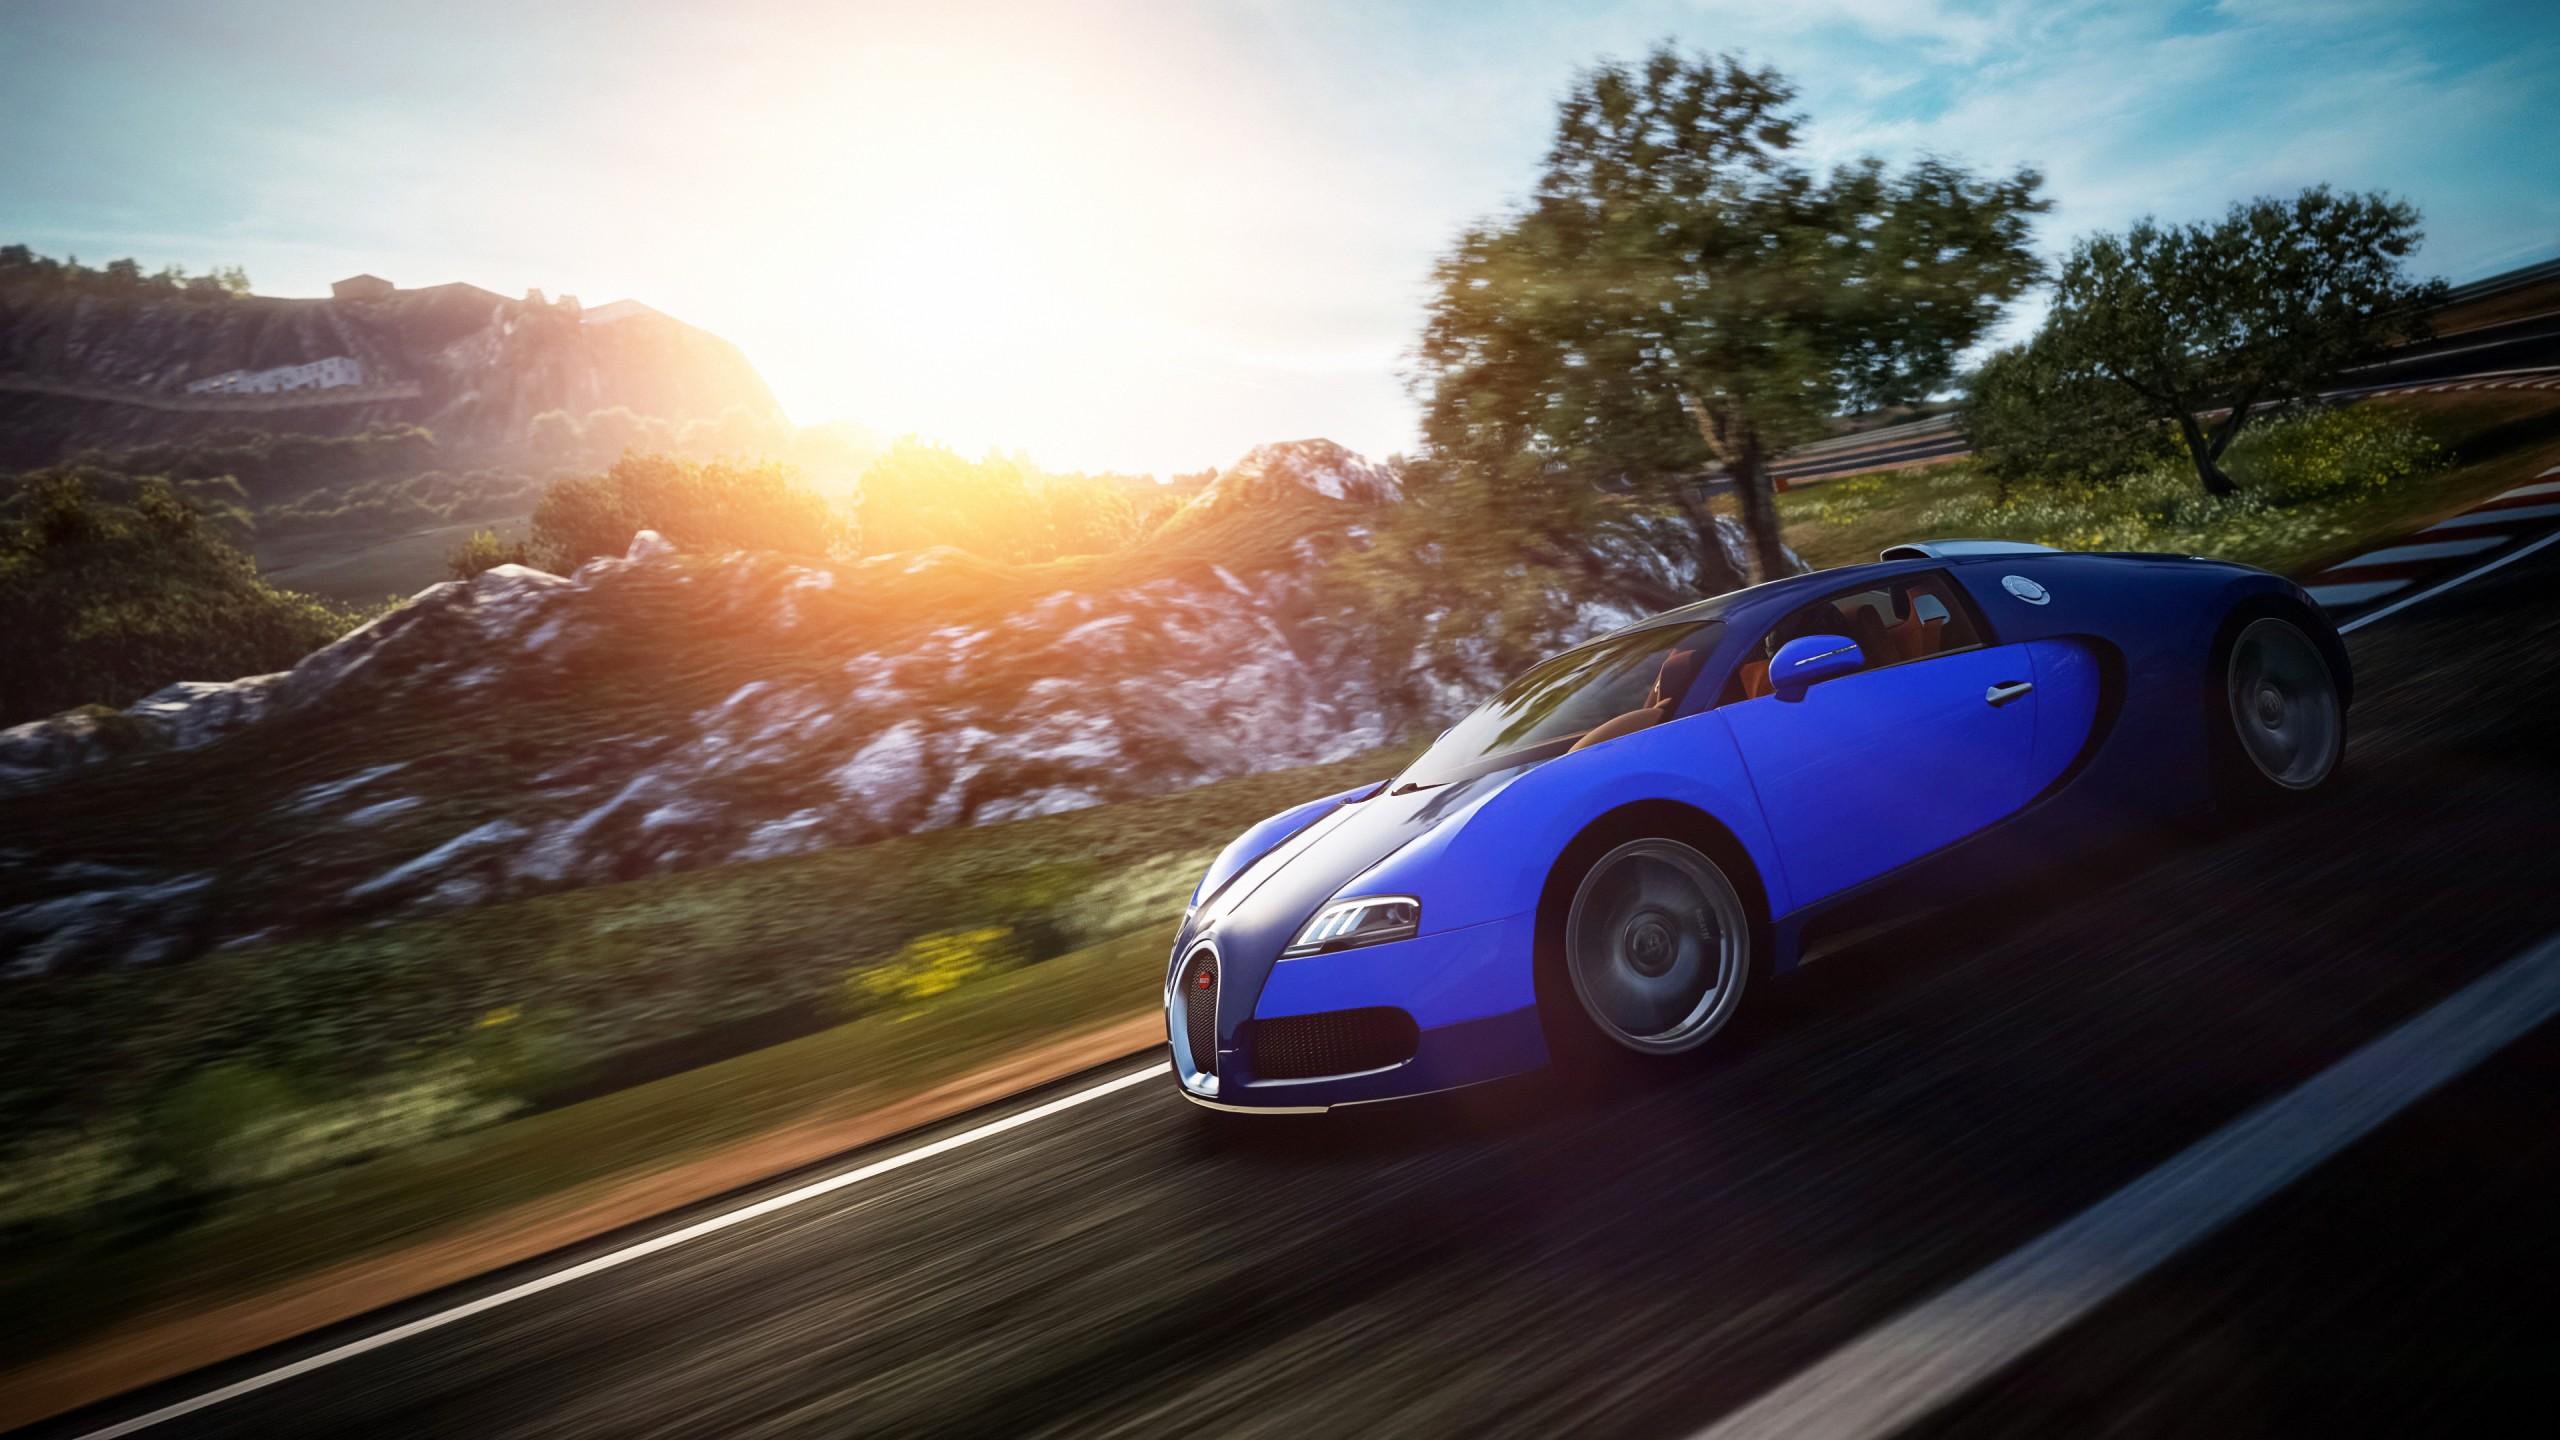 Super Cool Wallpapers For Girls Bugatti Veyron Eb 16 4 Gran Turismo 6 Wallpapers Hd